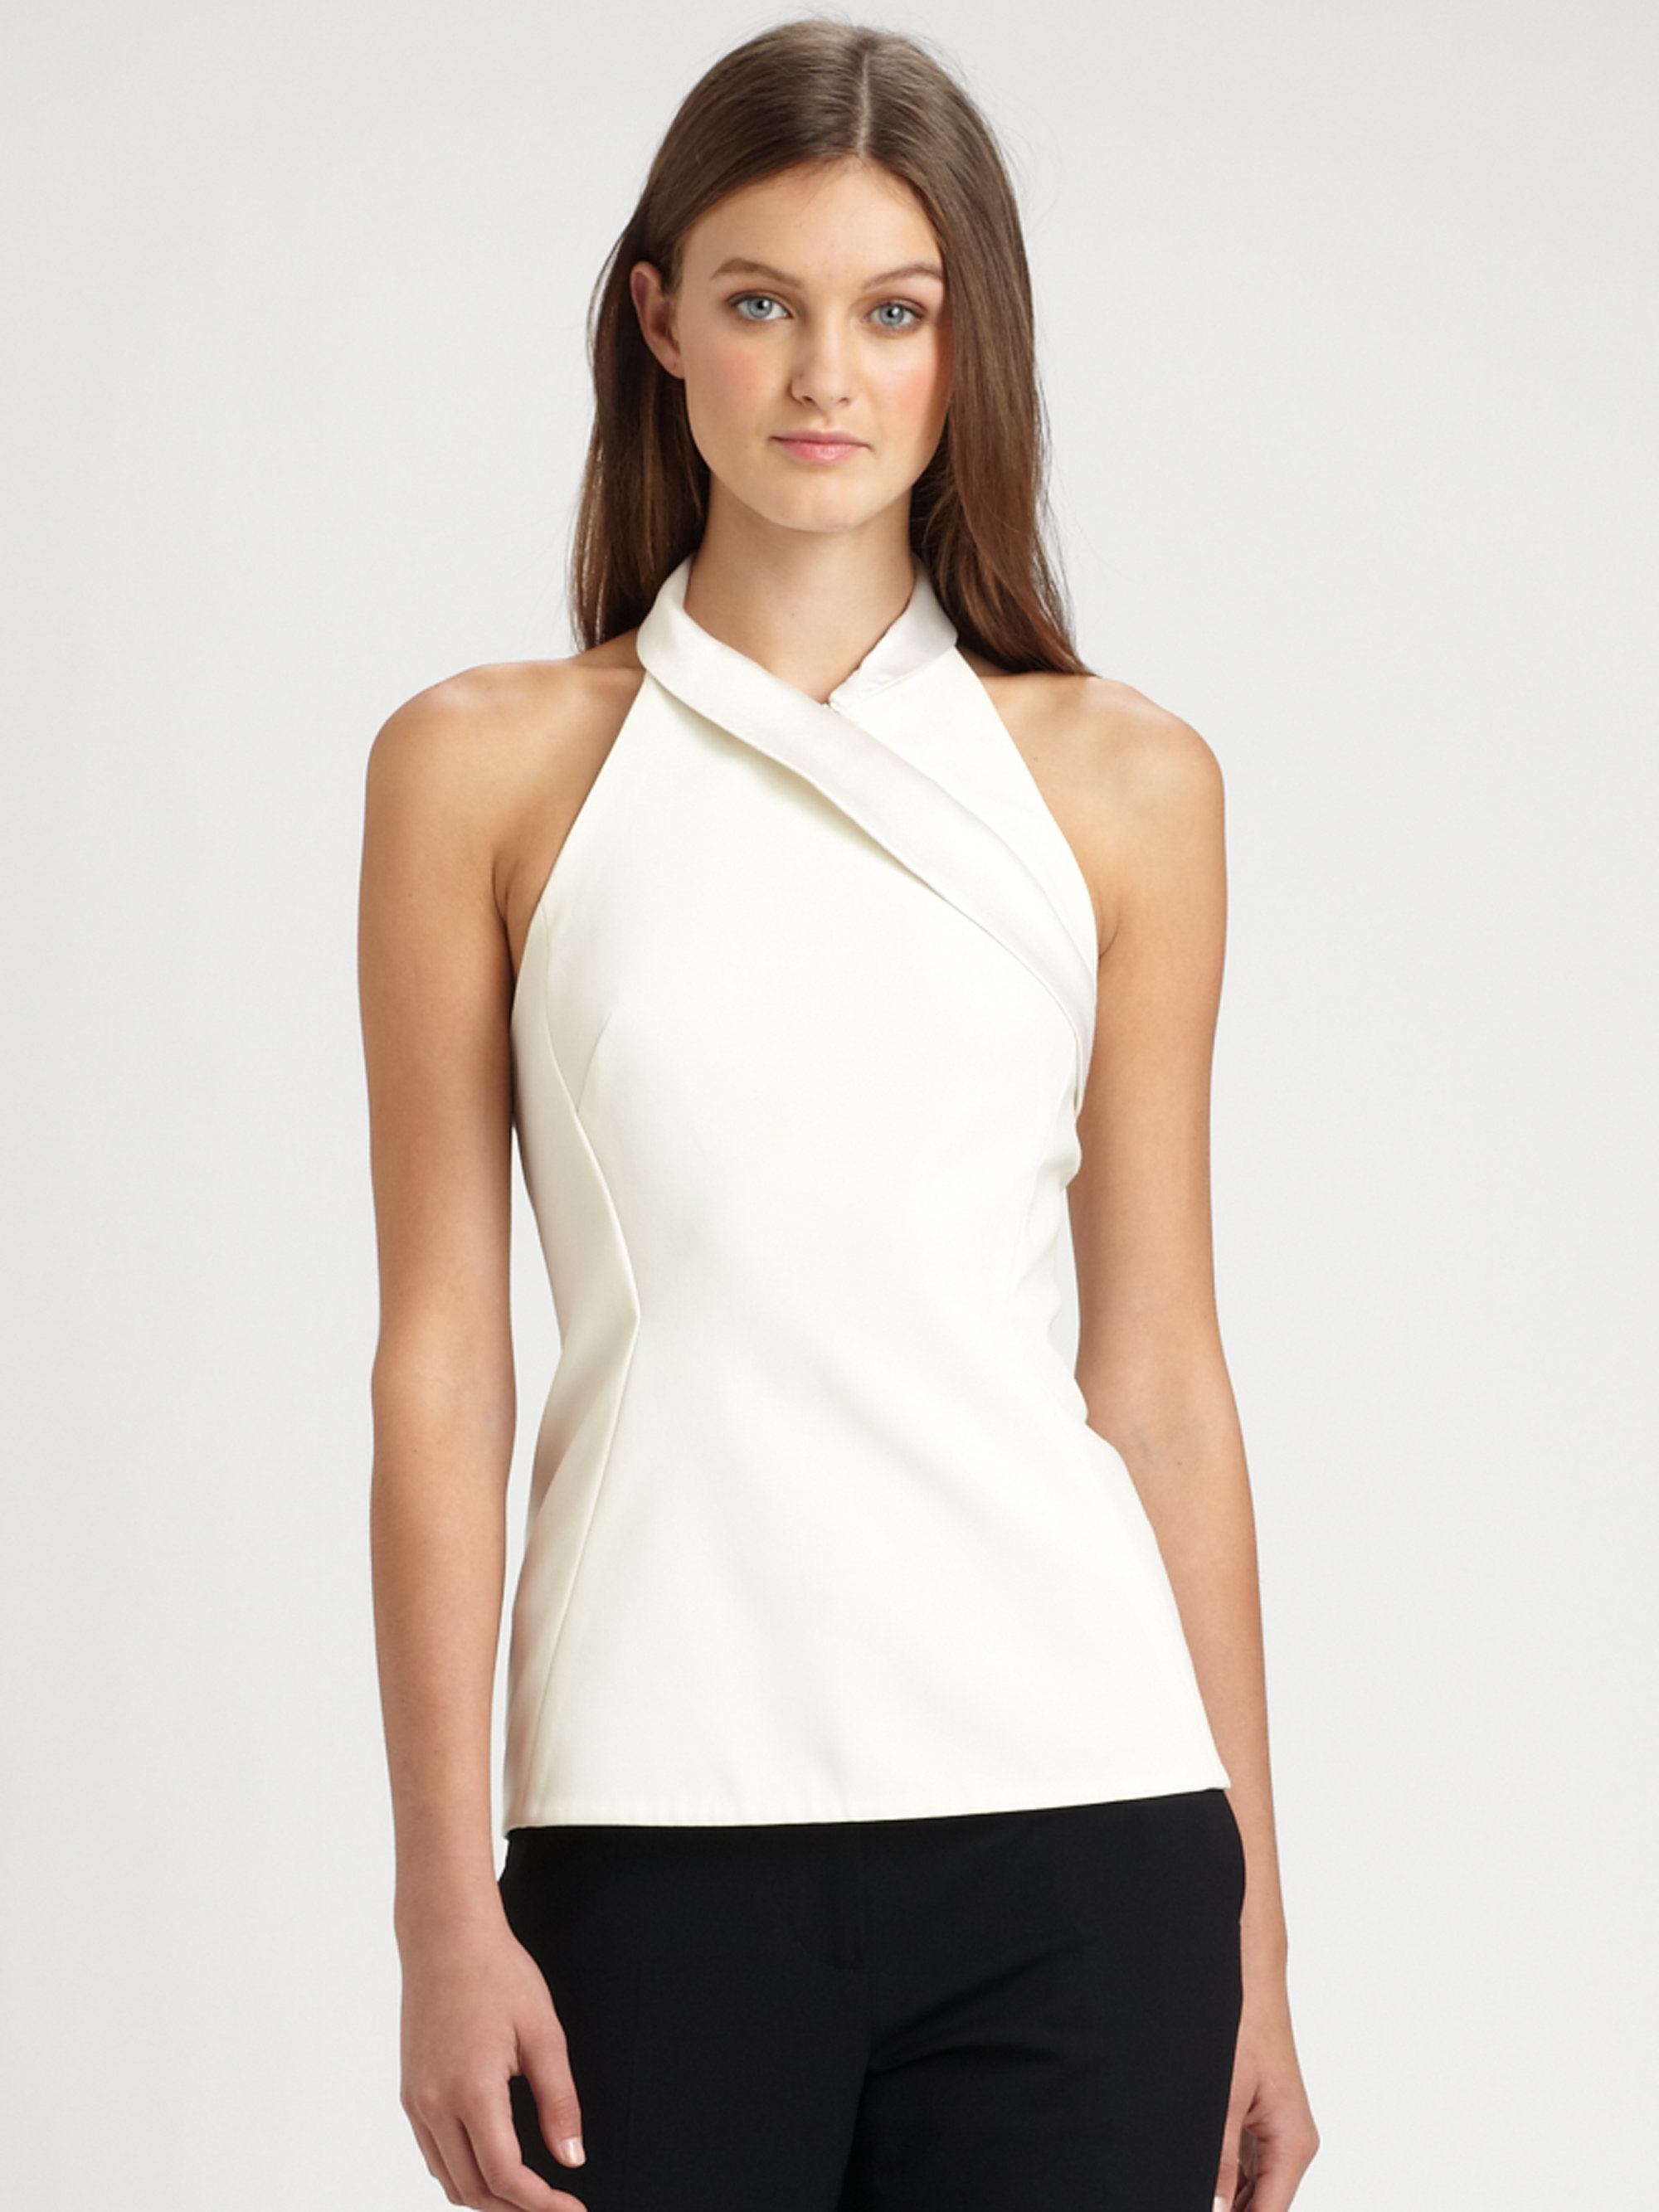 Crop Tops | White Crop Tops, Black Crop Top, Lace, Long ...  |Pvc White Halter Top